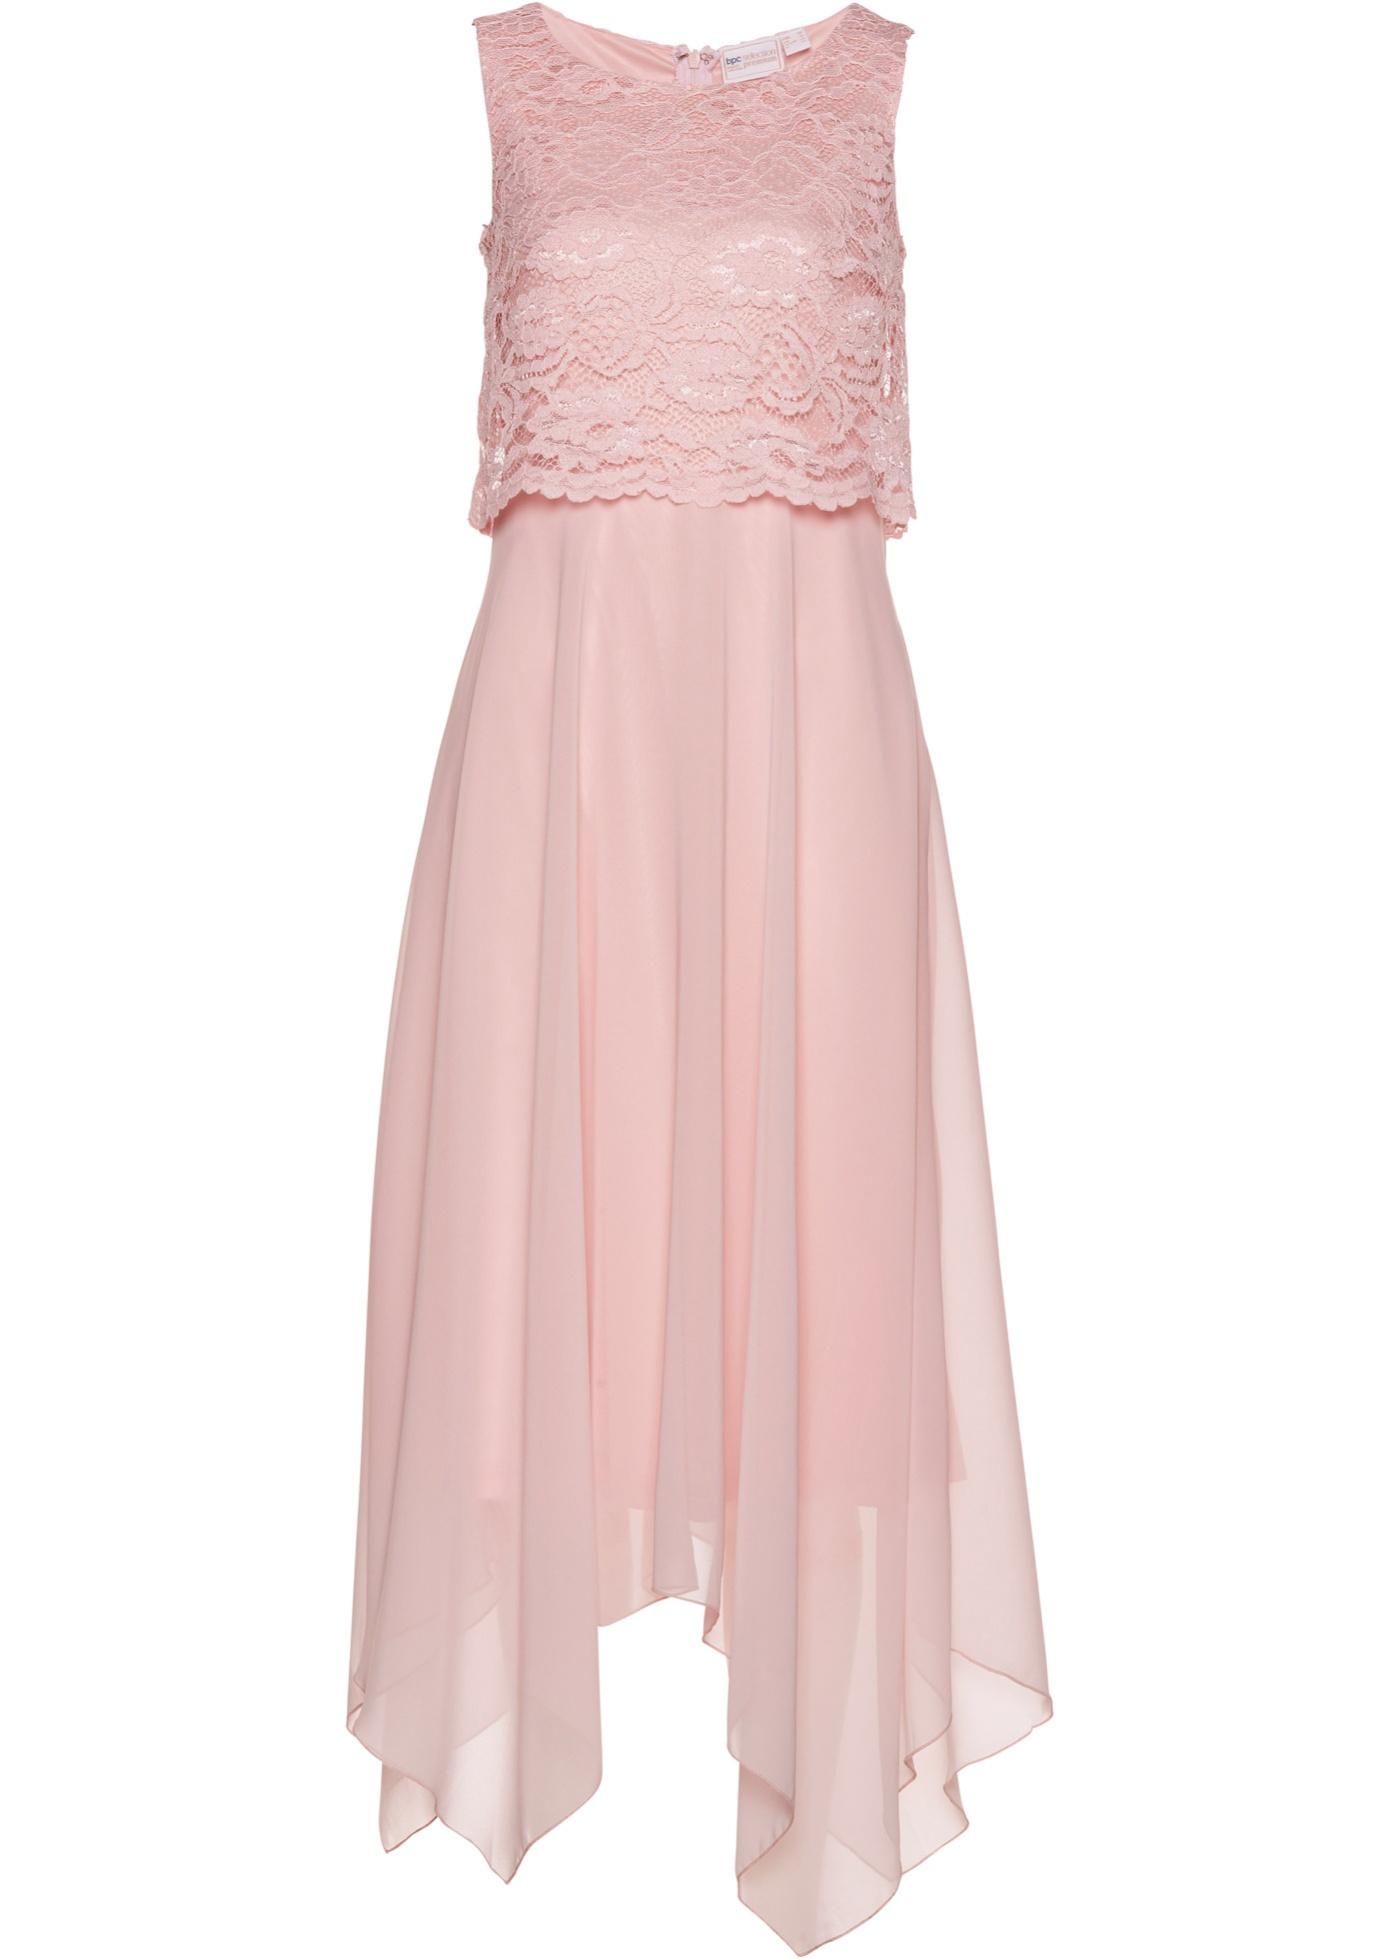 Festtagsmode - Premium Kleid › bonprix › rosa  - Onlineshop Bonprix